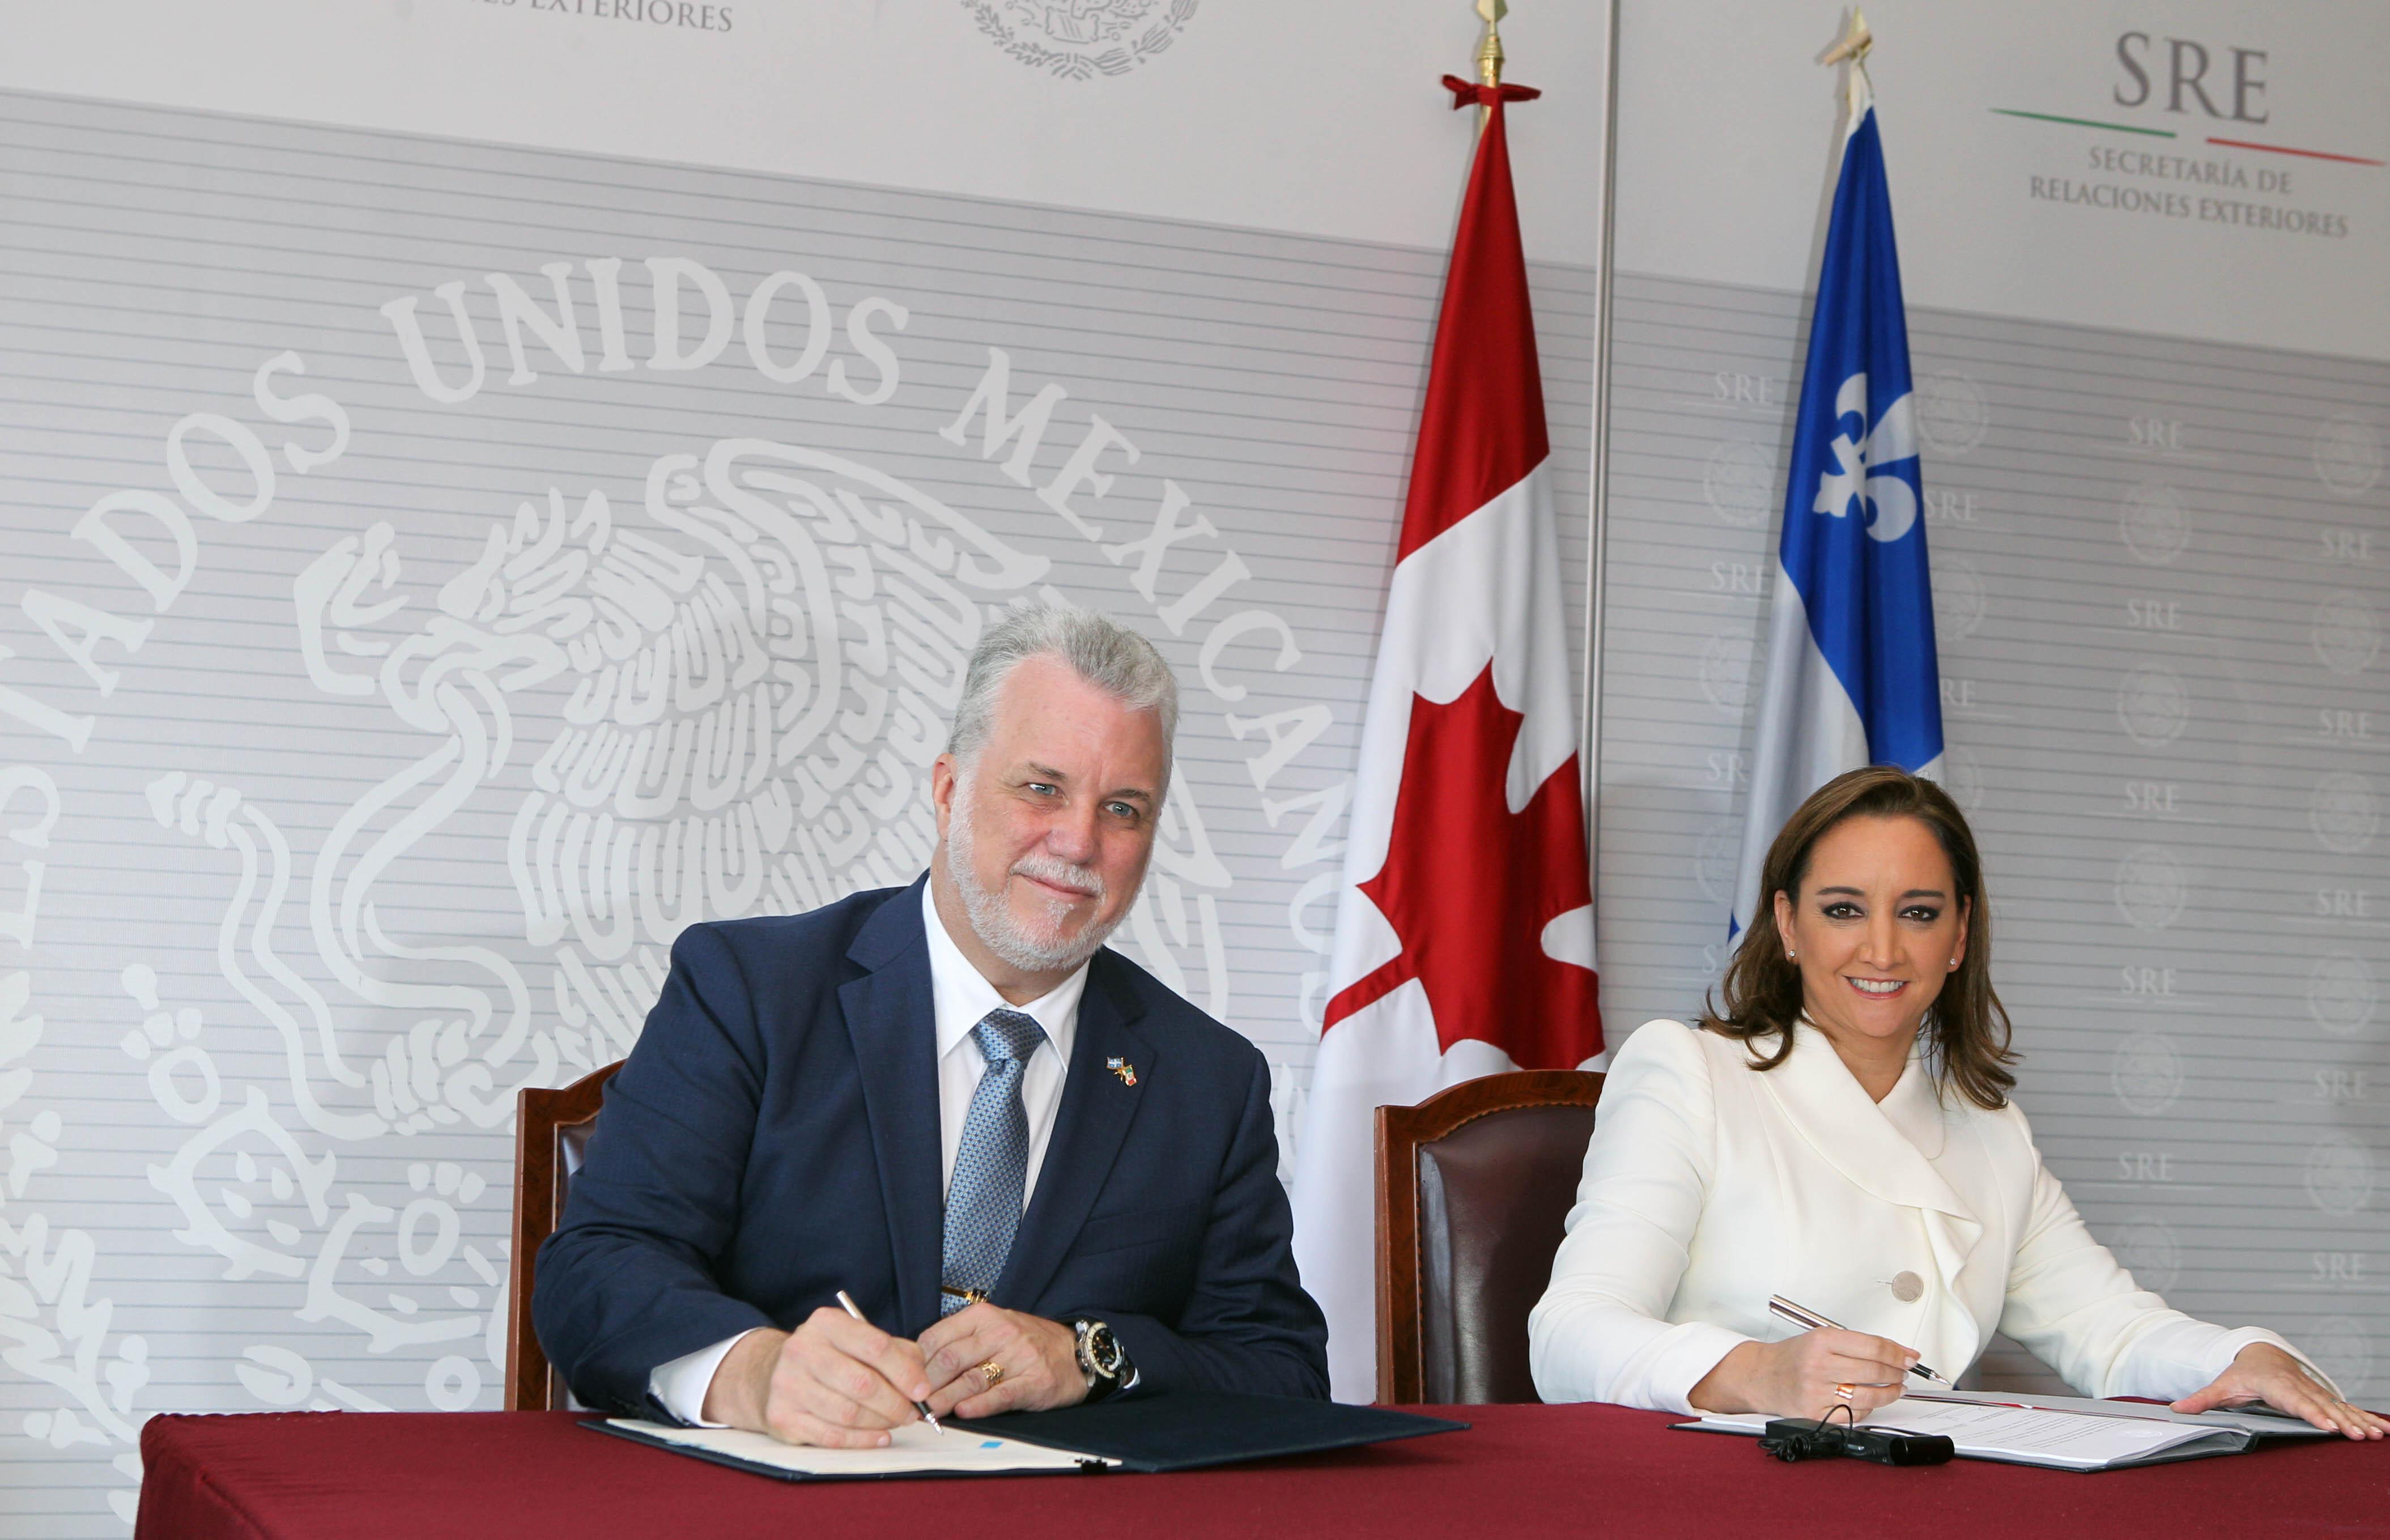 FOTO 4 Canciller Claudia Ruiz Massieu con el Primer Ministro de la Provincia de Quebec  Philippe Couillard  2 jpg